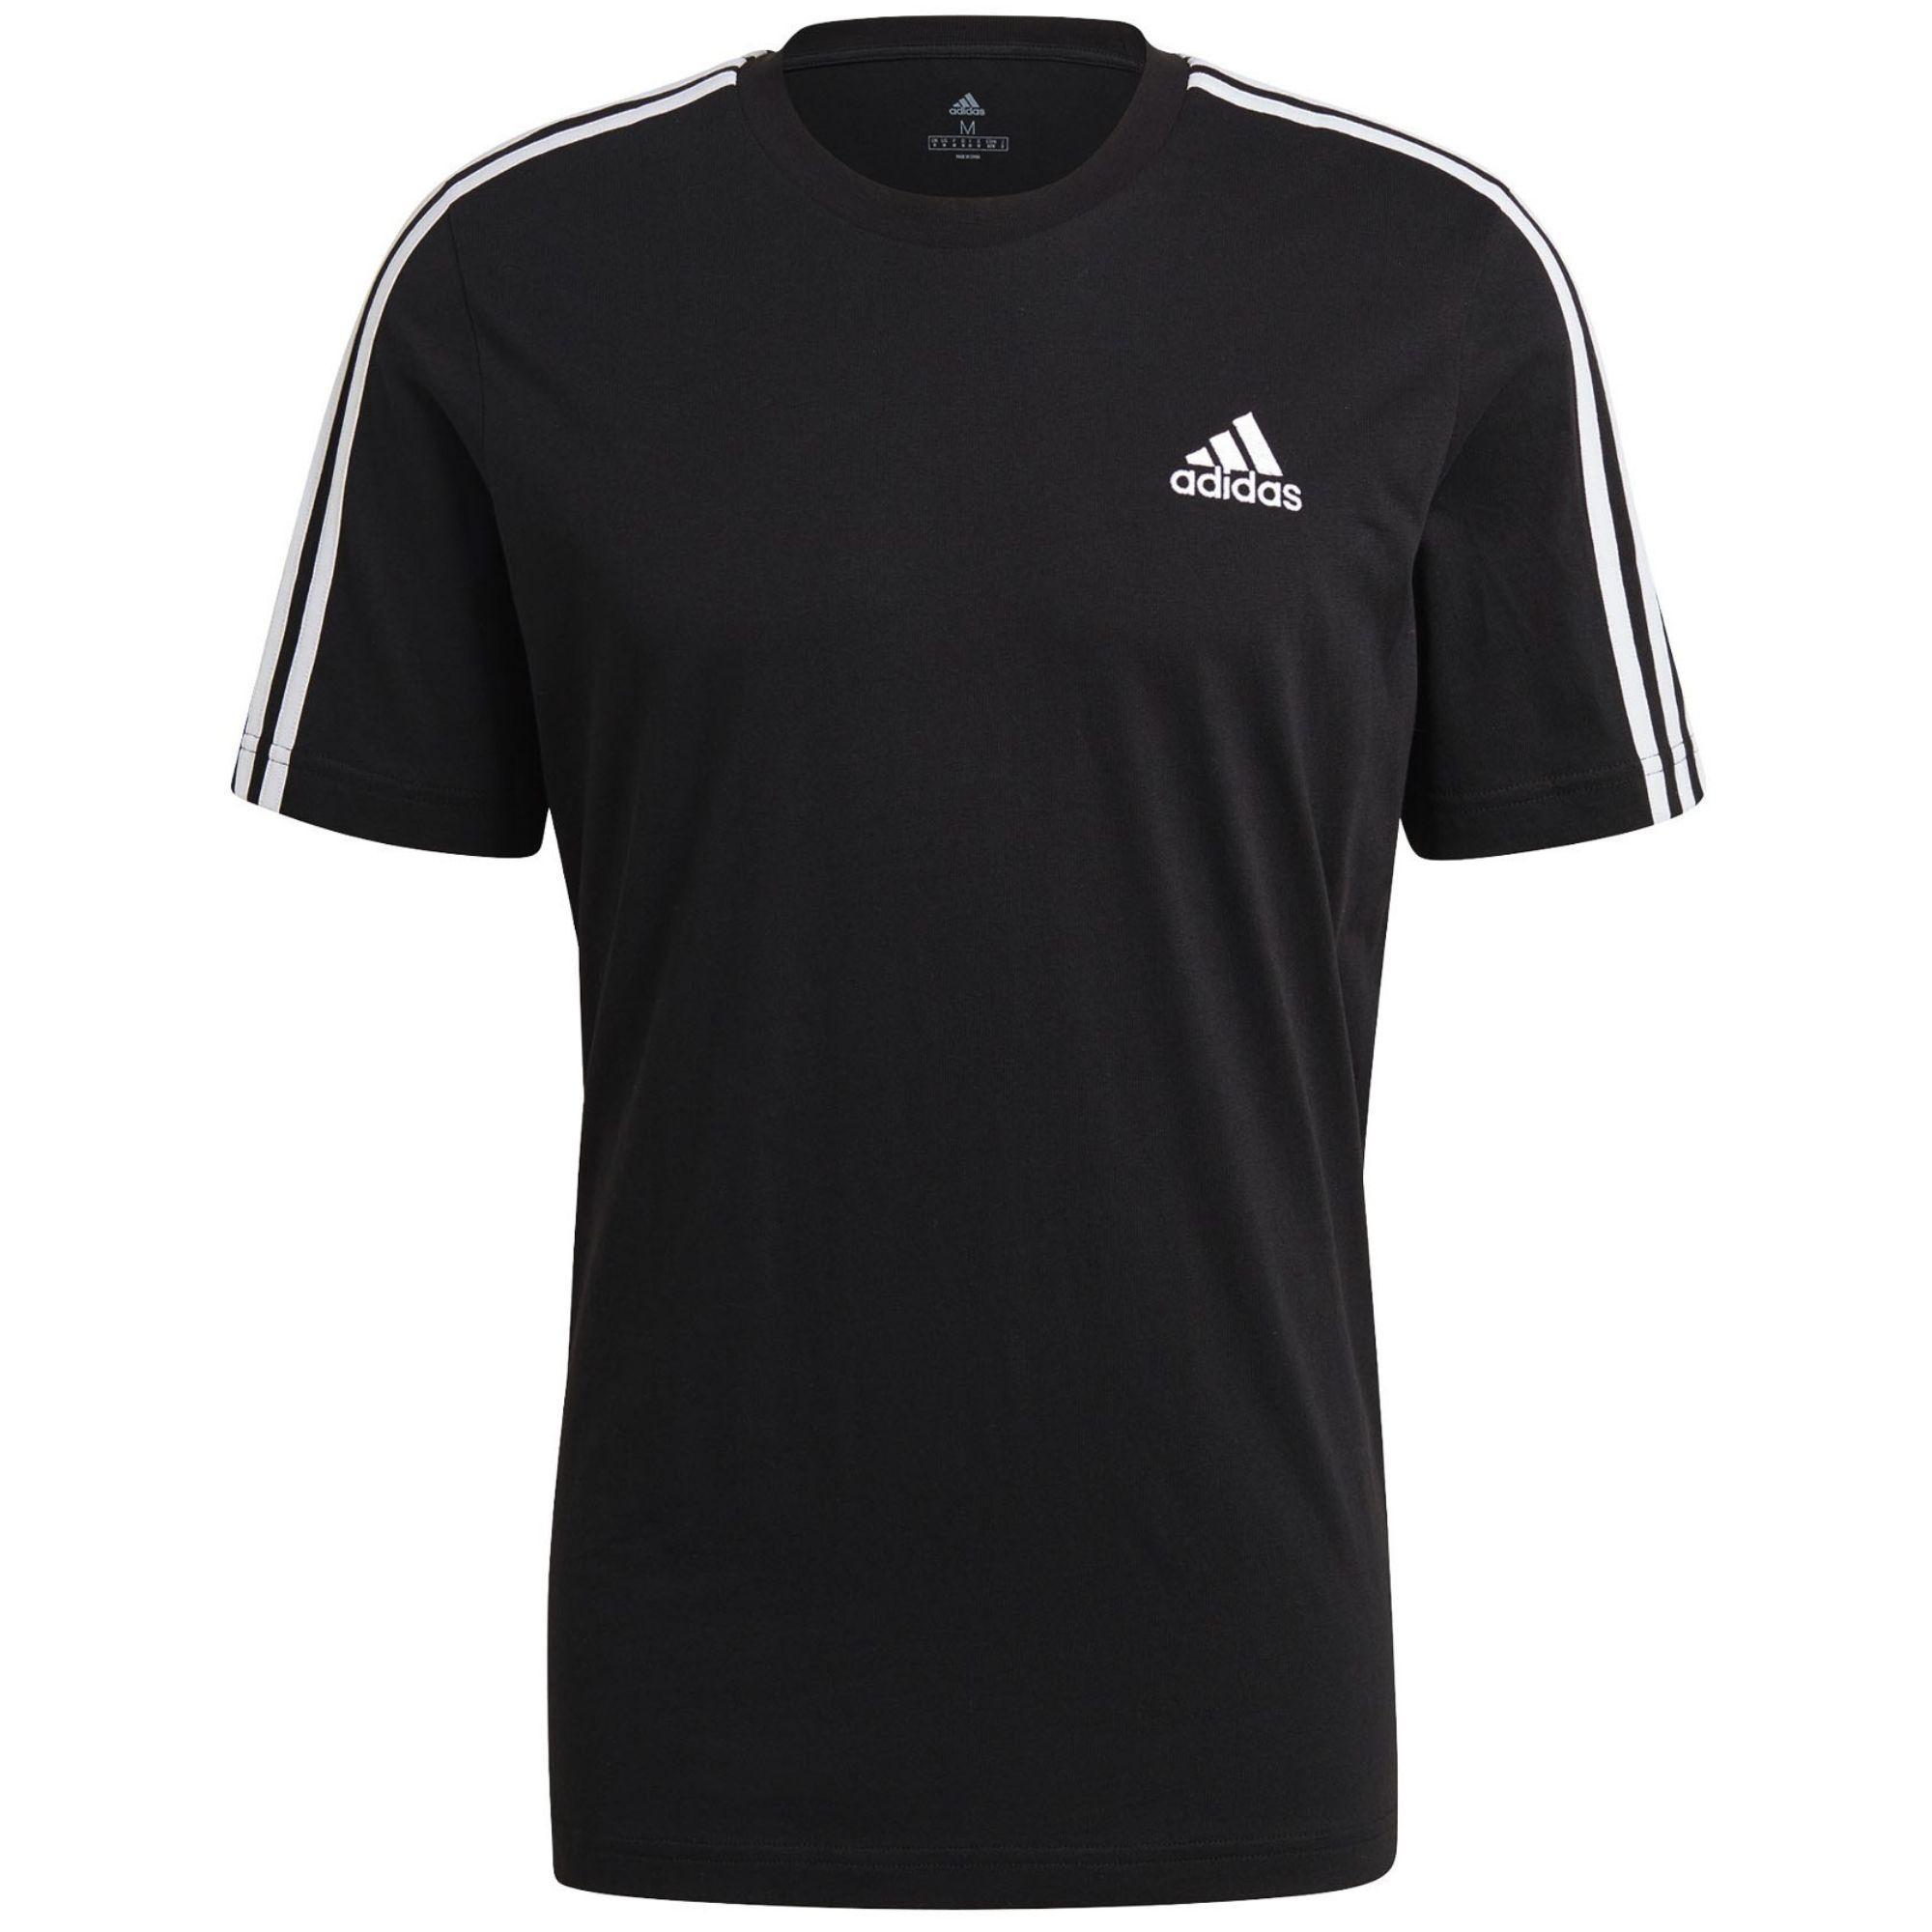 Camiseta ADIDAS NEGRA